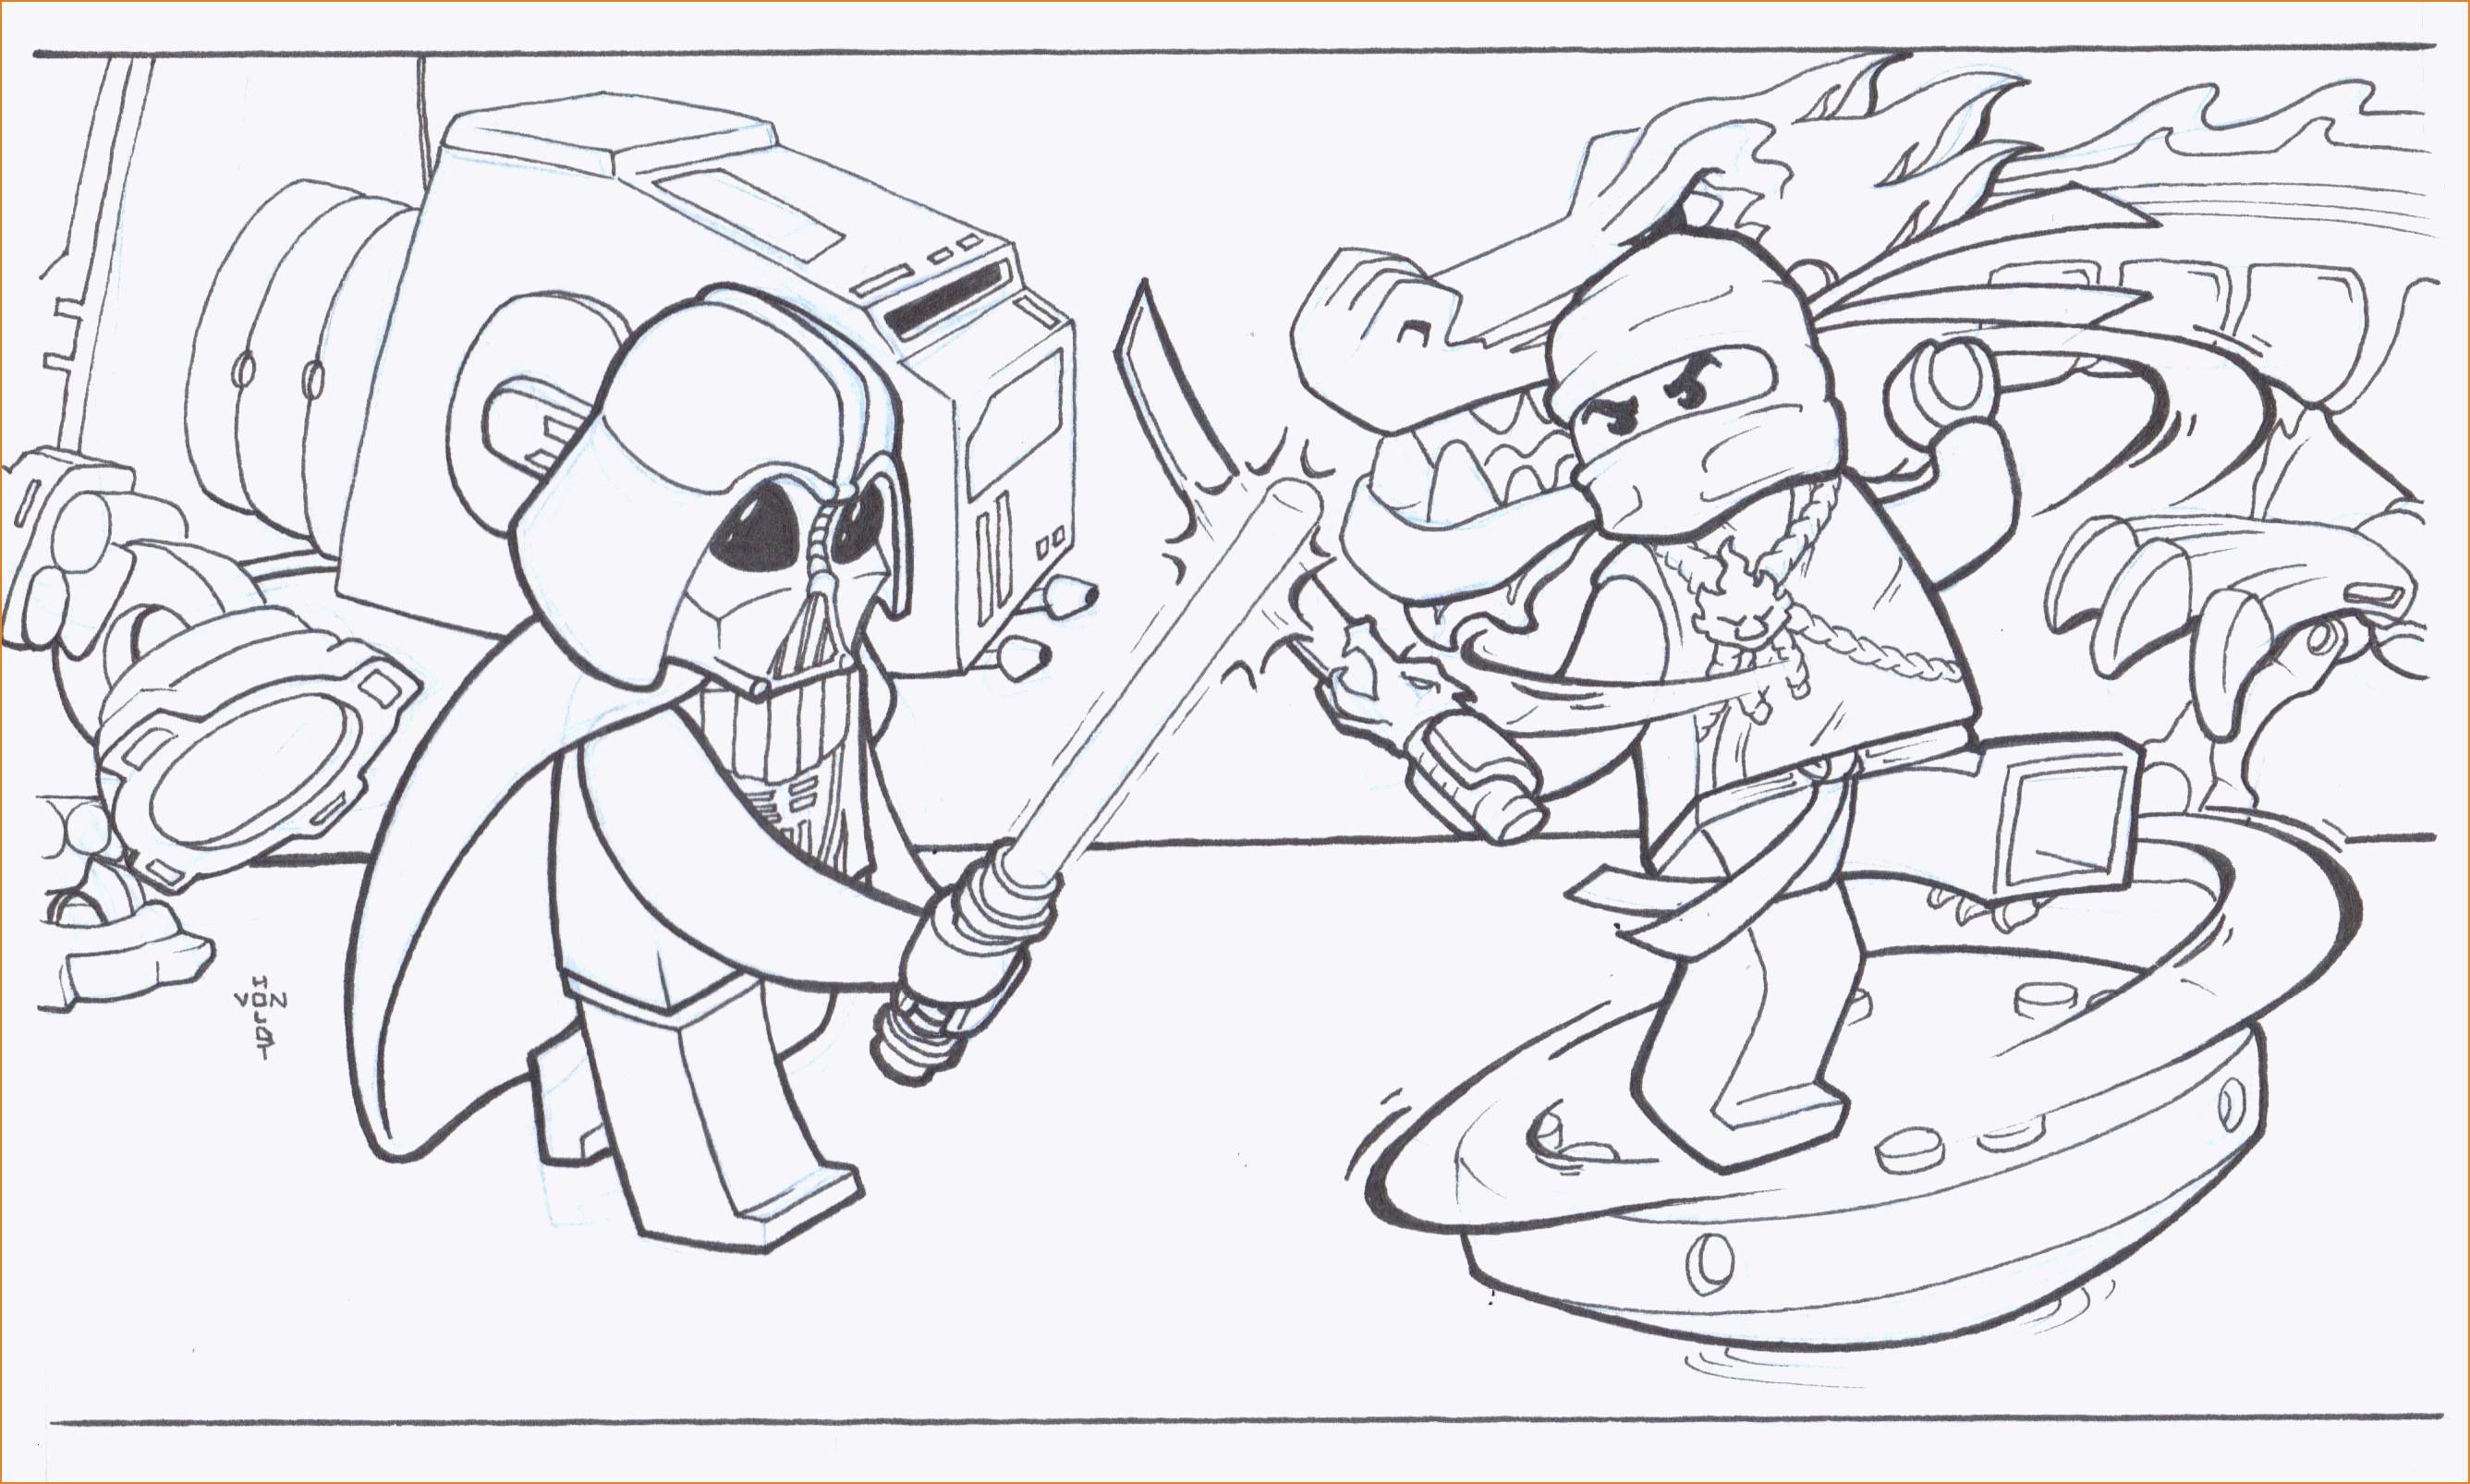 Ninjago Ausmalbilder Lord Garmadon Inspirierend 40 Ninjago Ausmalbilder Zane Scoredatscore Genial Ninjago Stock